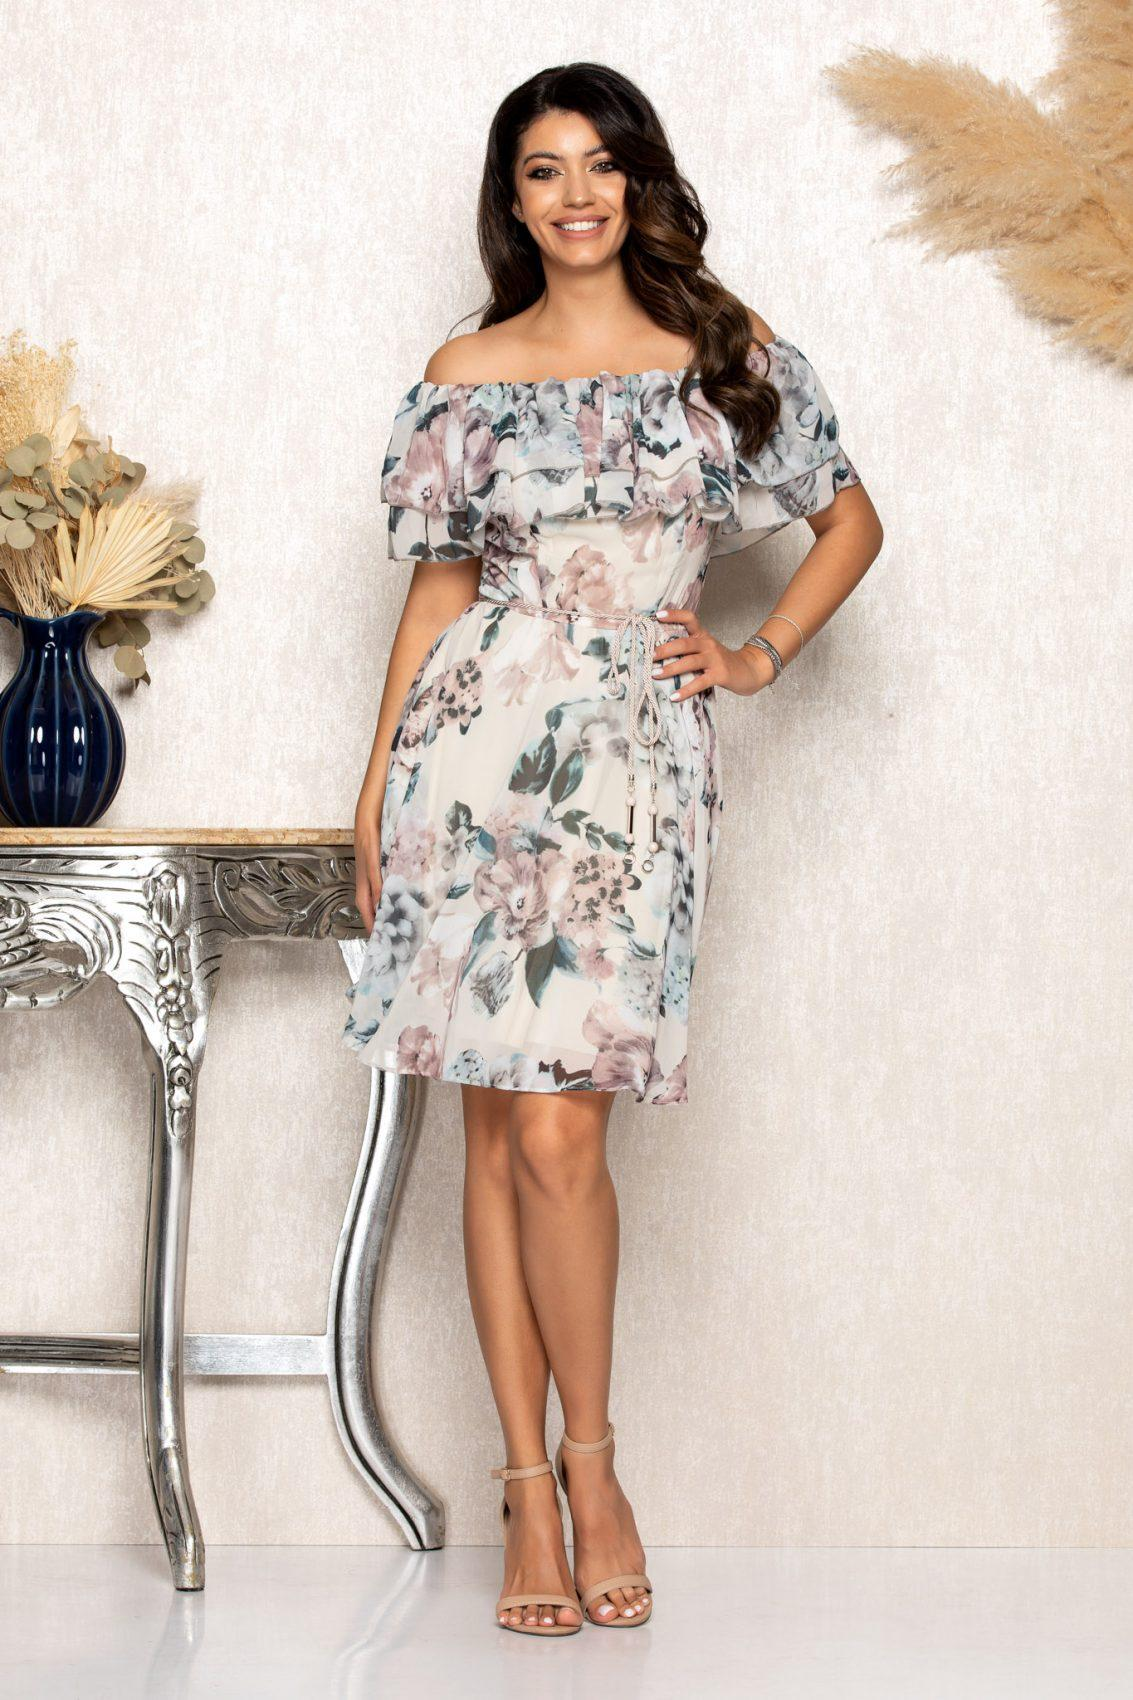 Nude Φλοράλ Φόρεμα Με Βολάν Jasmine B120 1